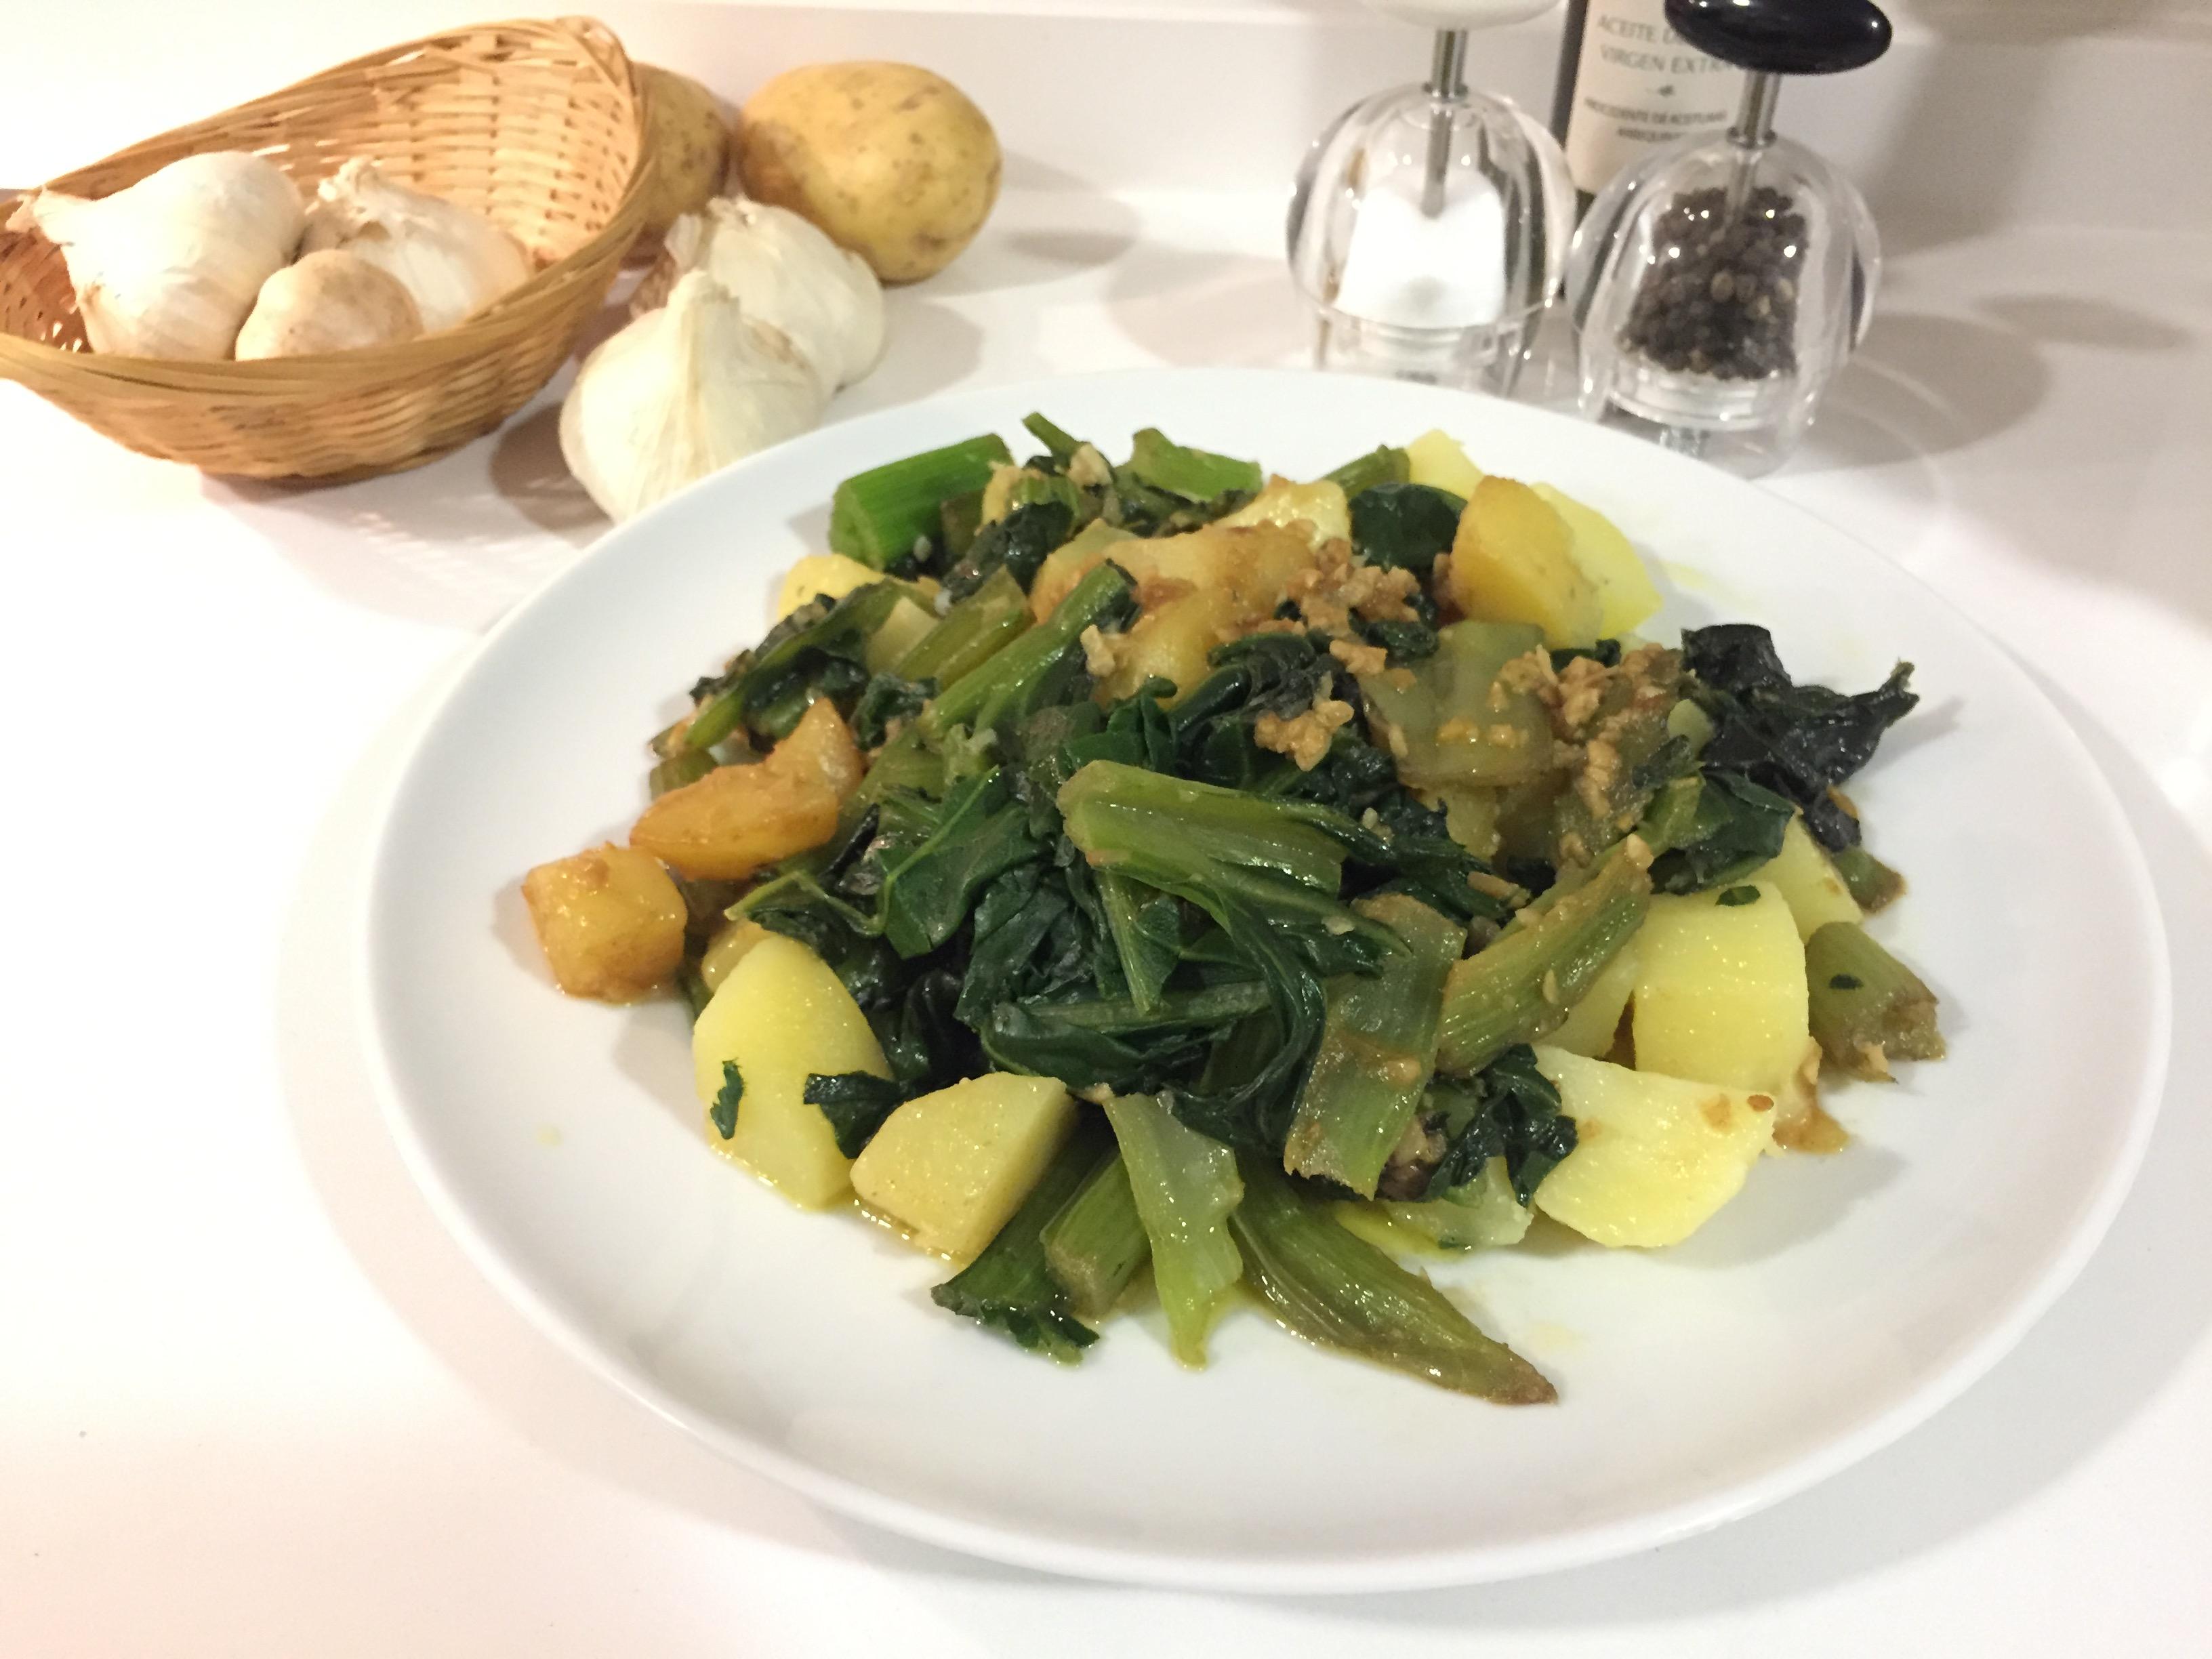 Receta Sencilla De Verduras Acelgas Con Patatas Verduras